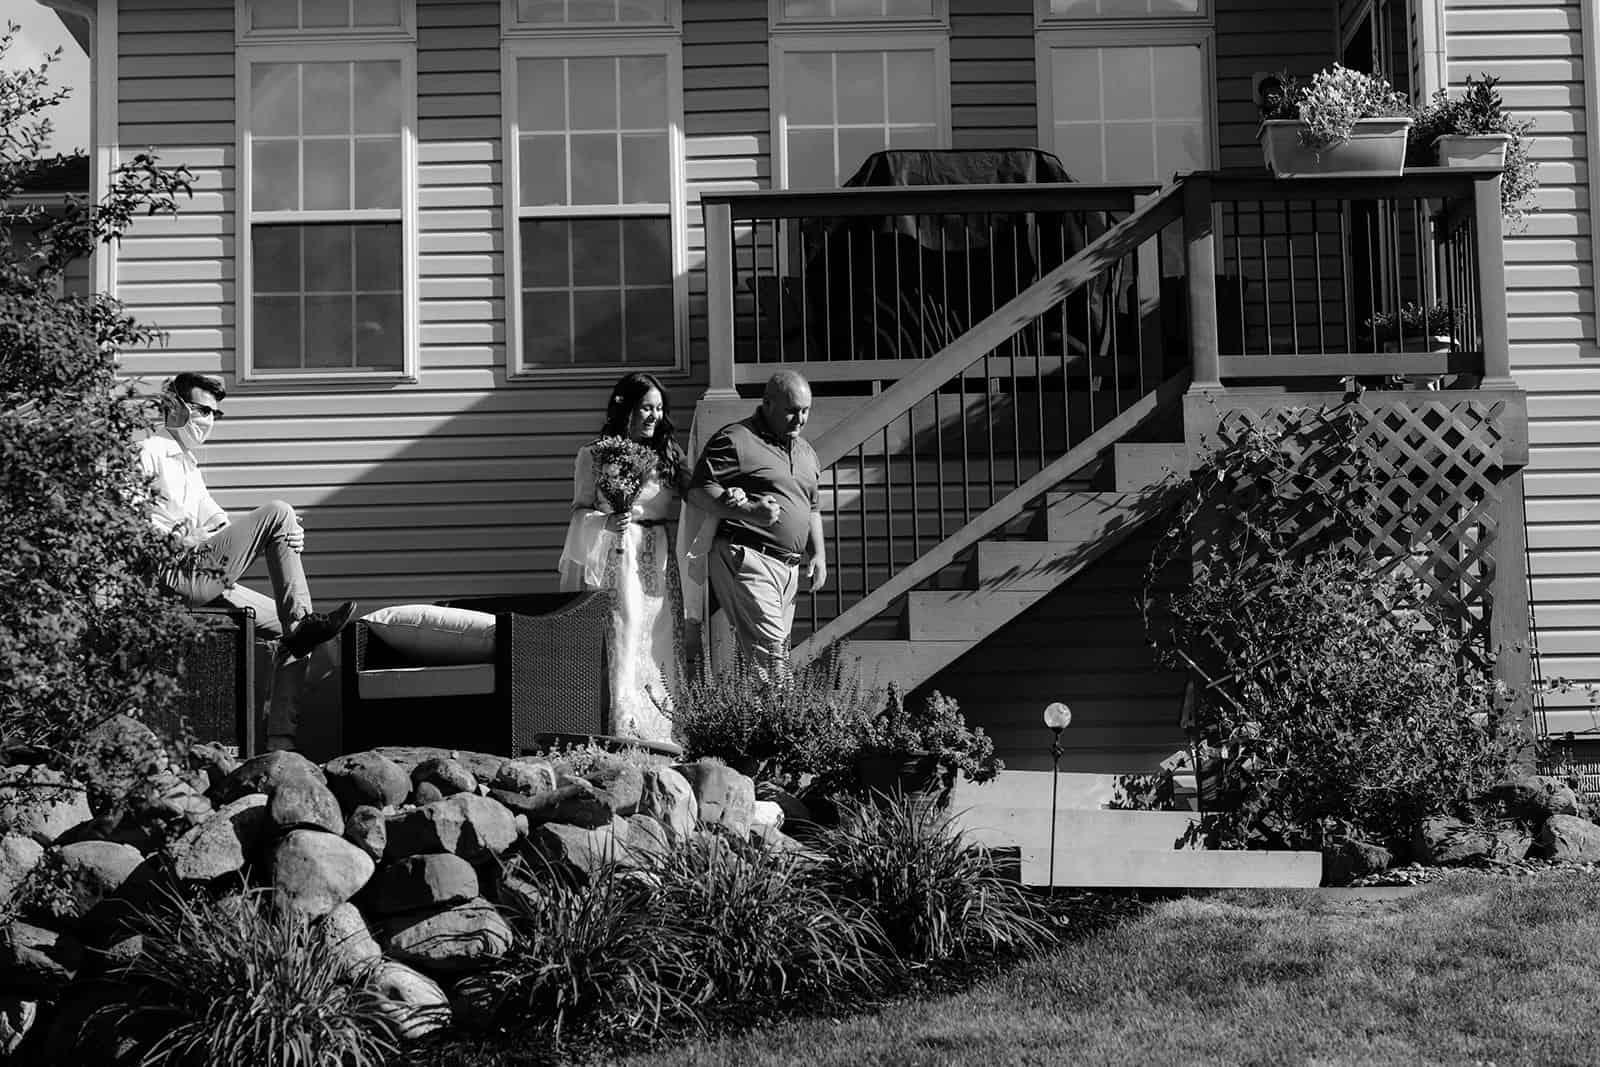 COVID-19 Backyard Wedding - WILLIAM + KAYLA 221